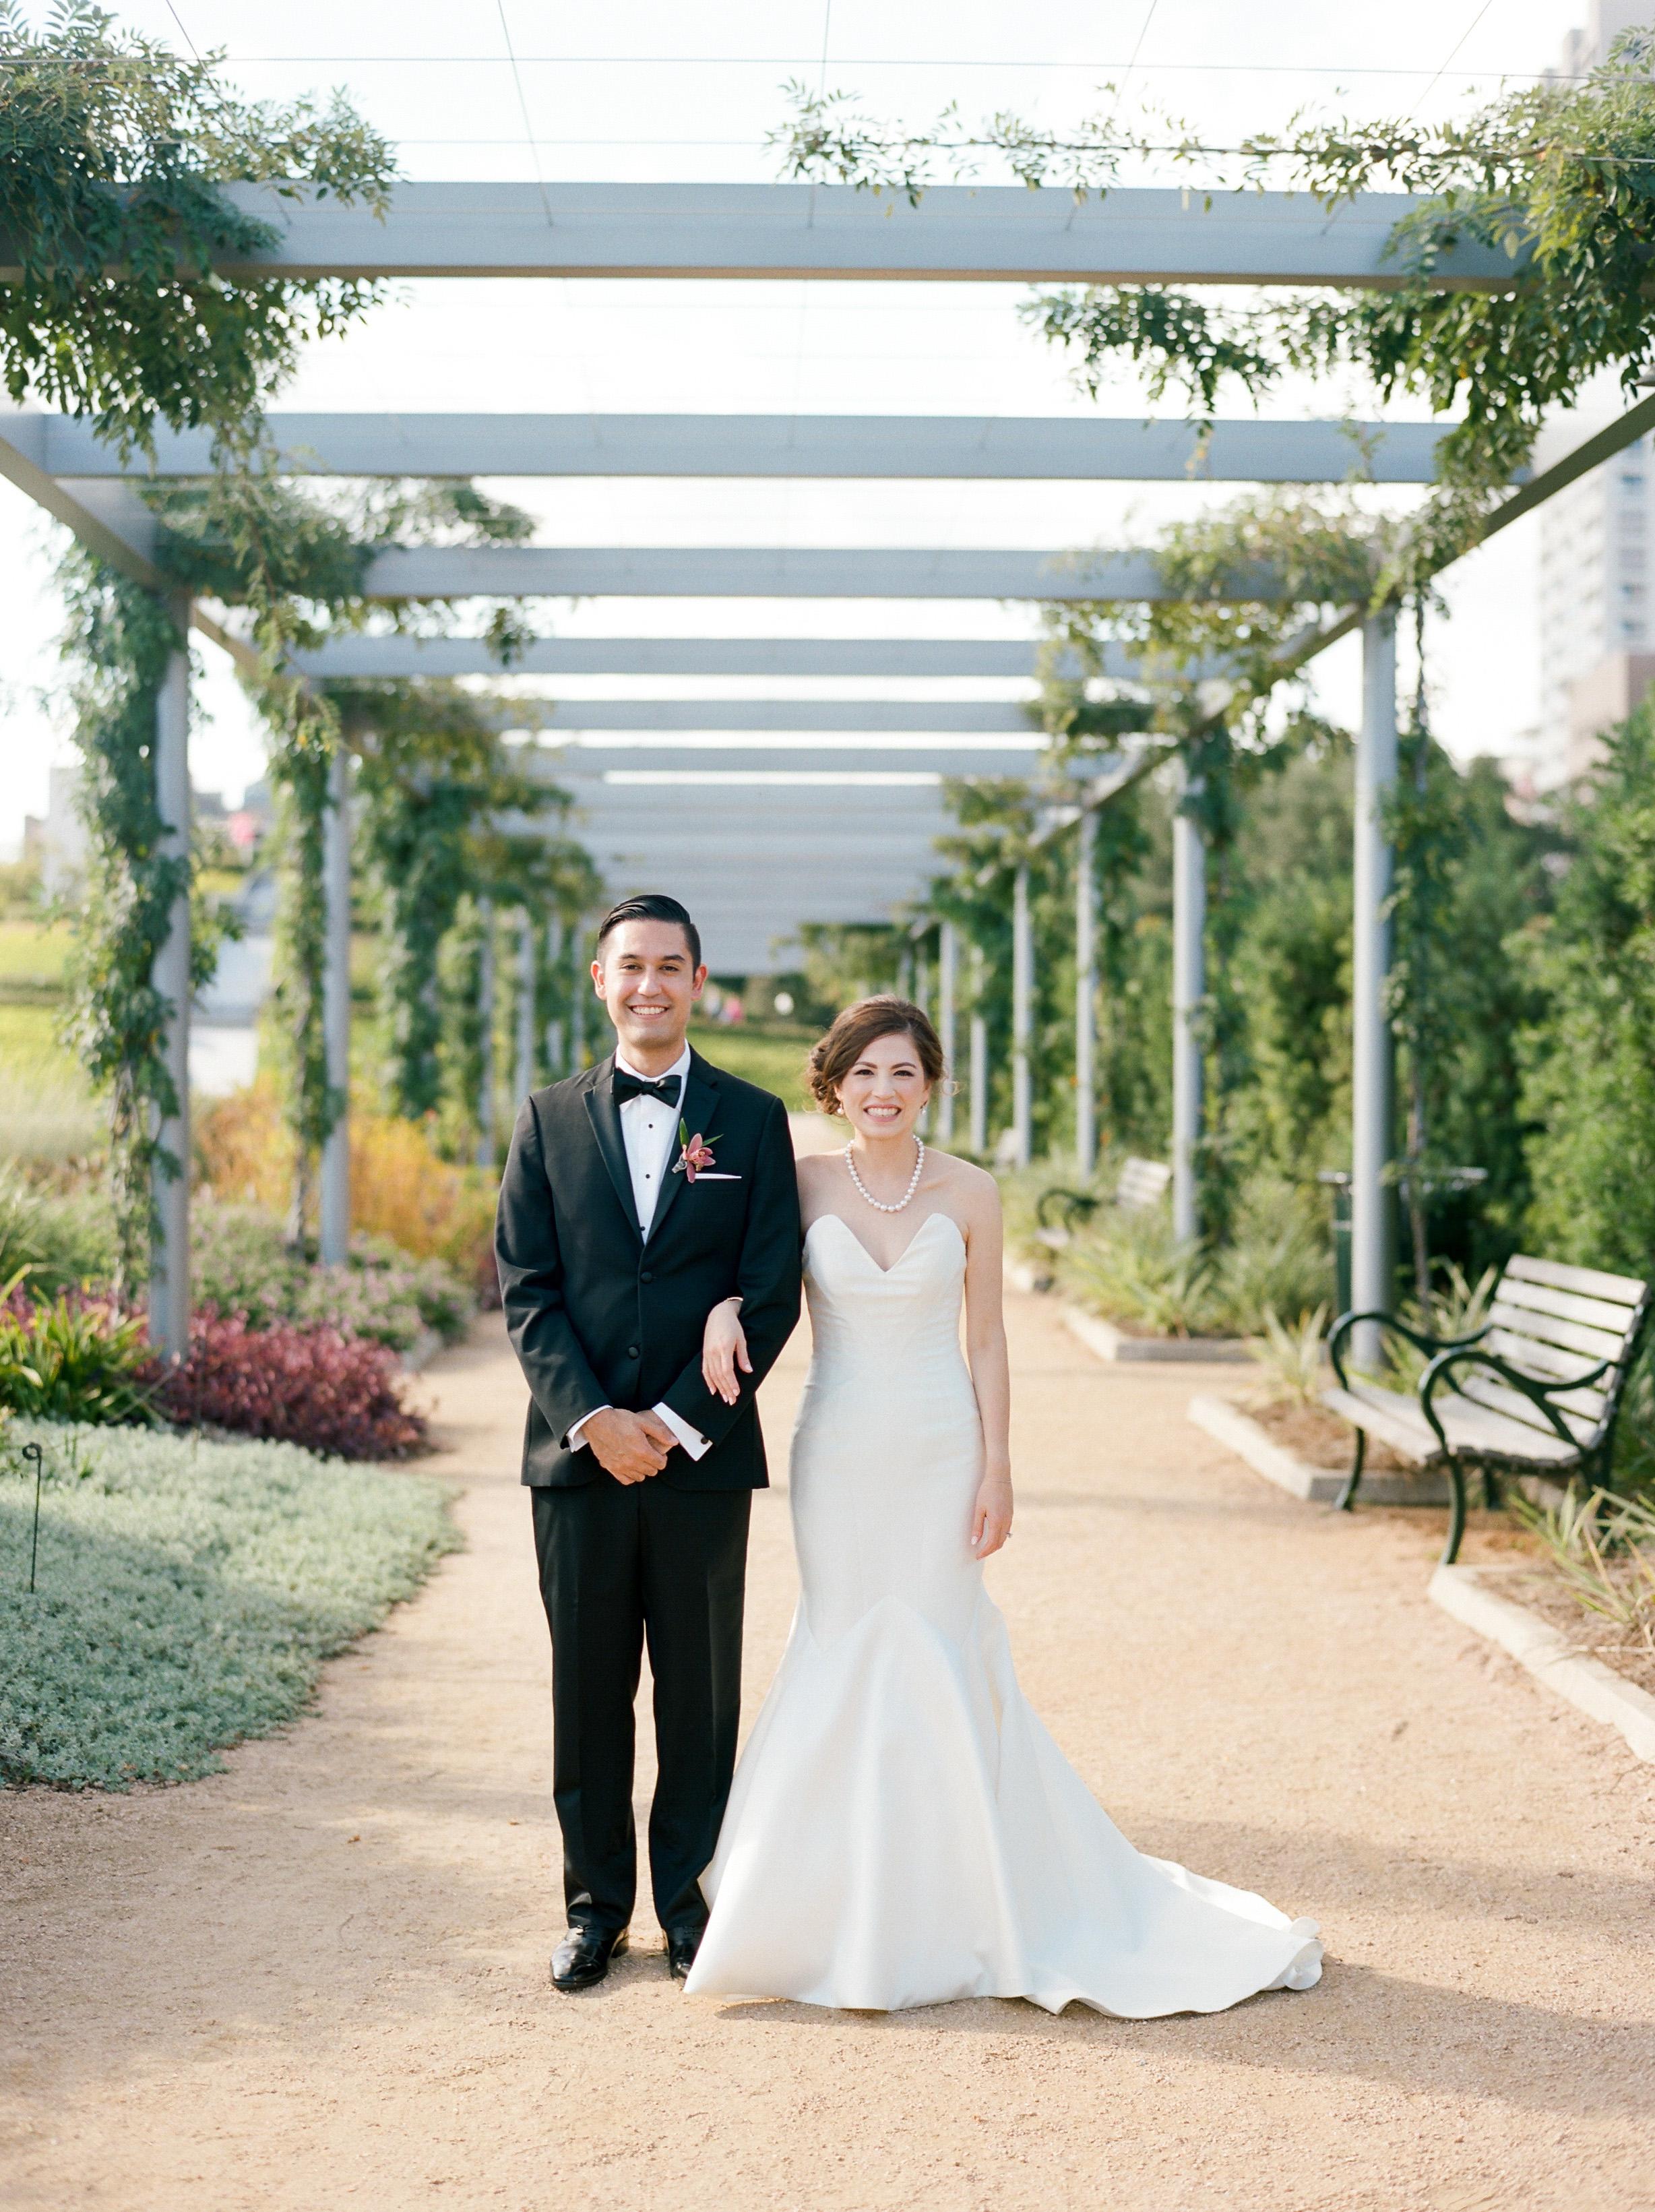 The-Knot-Texas-Magazine-Wedding-Top-Best-Houston-Wedding-Photographer-Fine-Art-Film-Dana-Fernandez-Photography-117.jpg